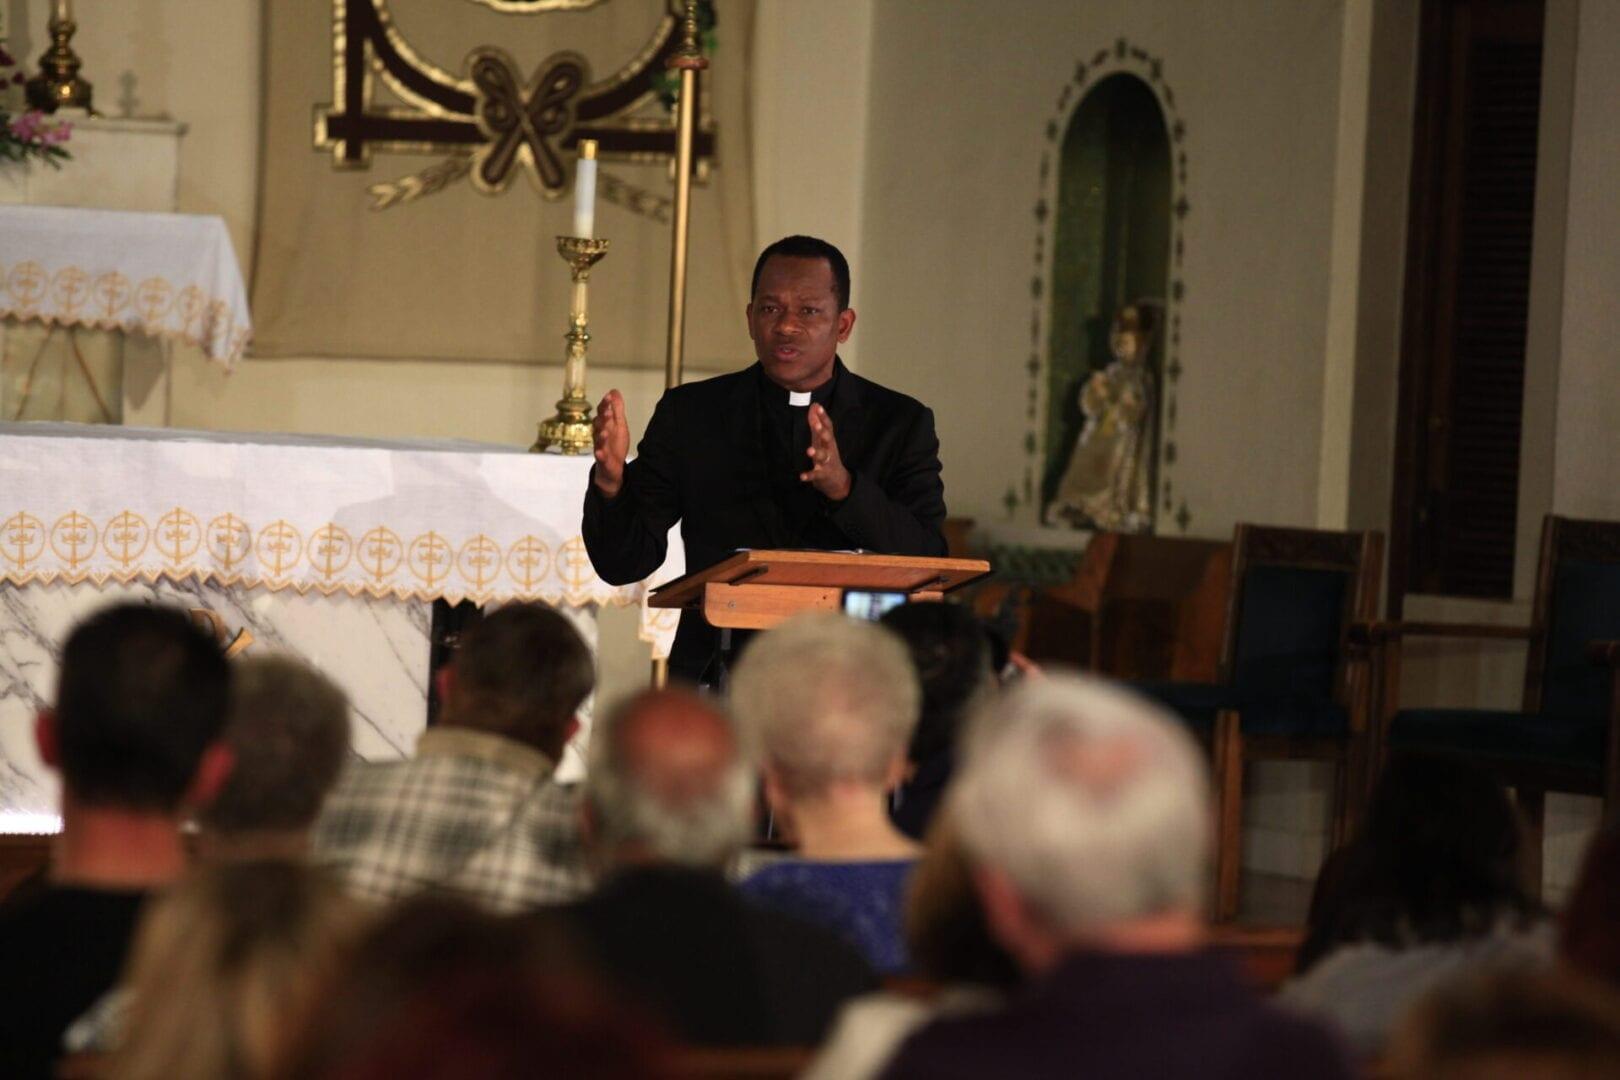 Fr. Maurice Emelu speech in the meeting